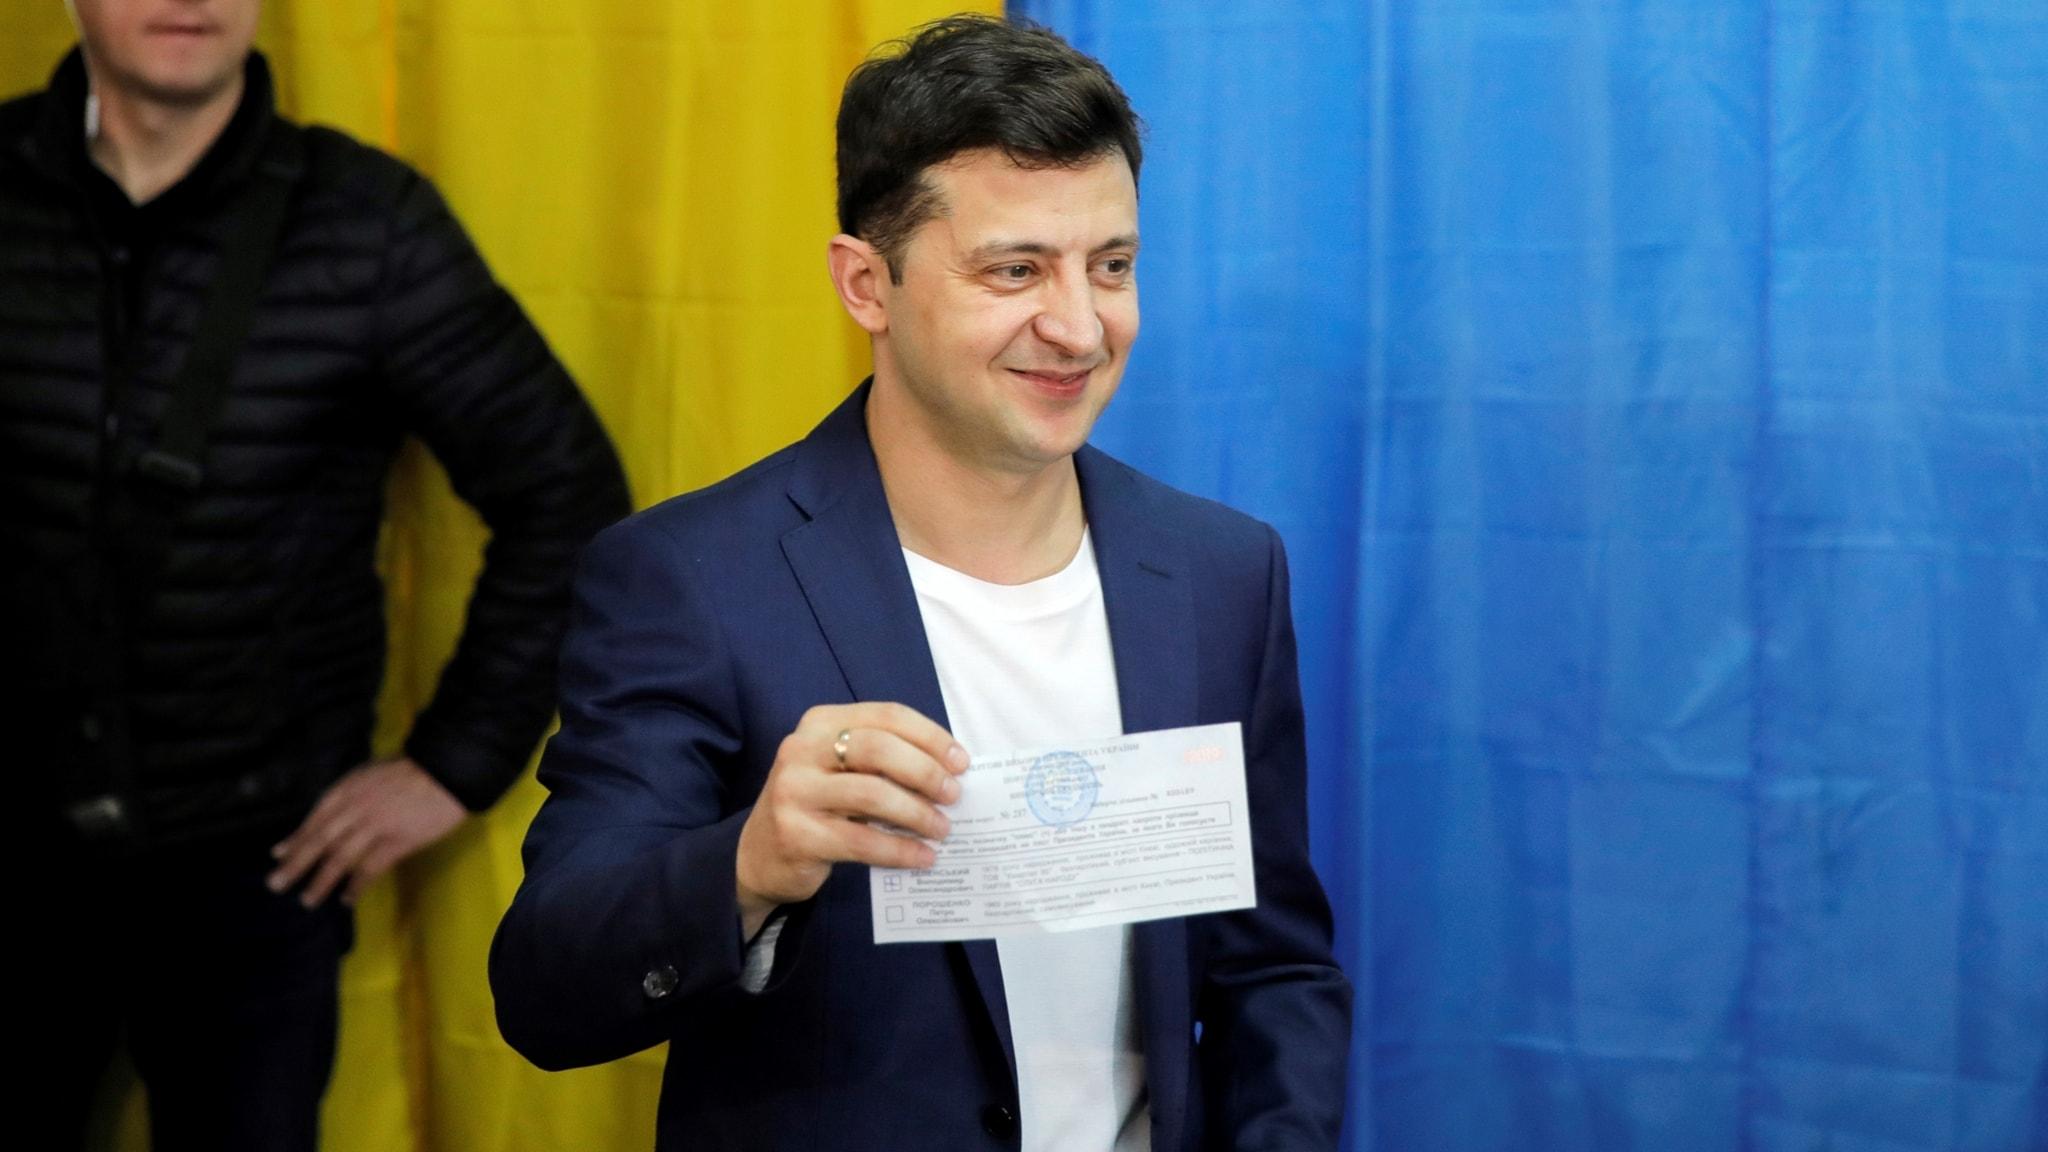 President Zelenskyjs parti får 44 procent enligt vallokalsundersökning.